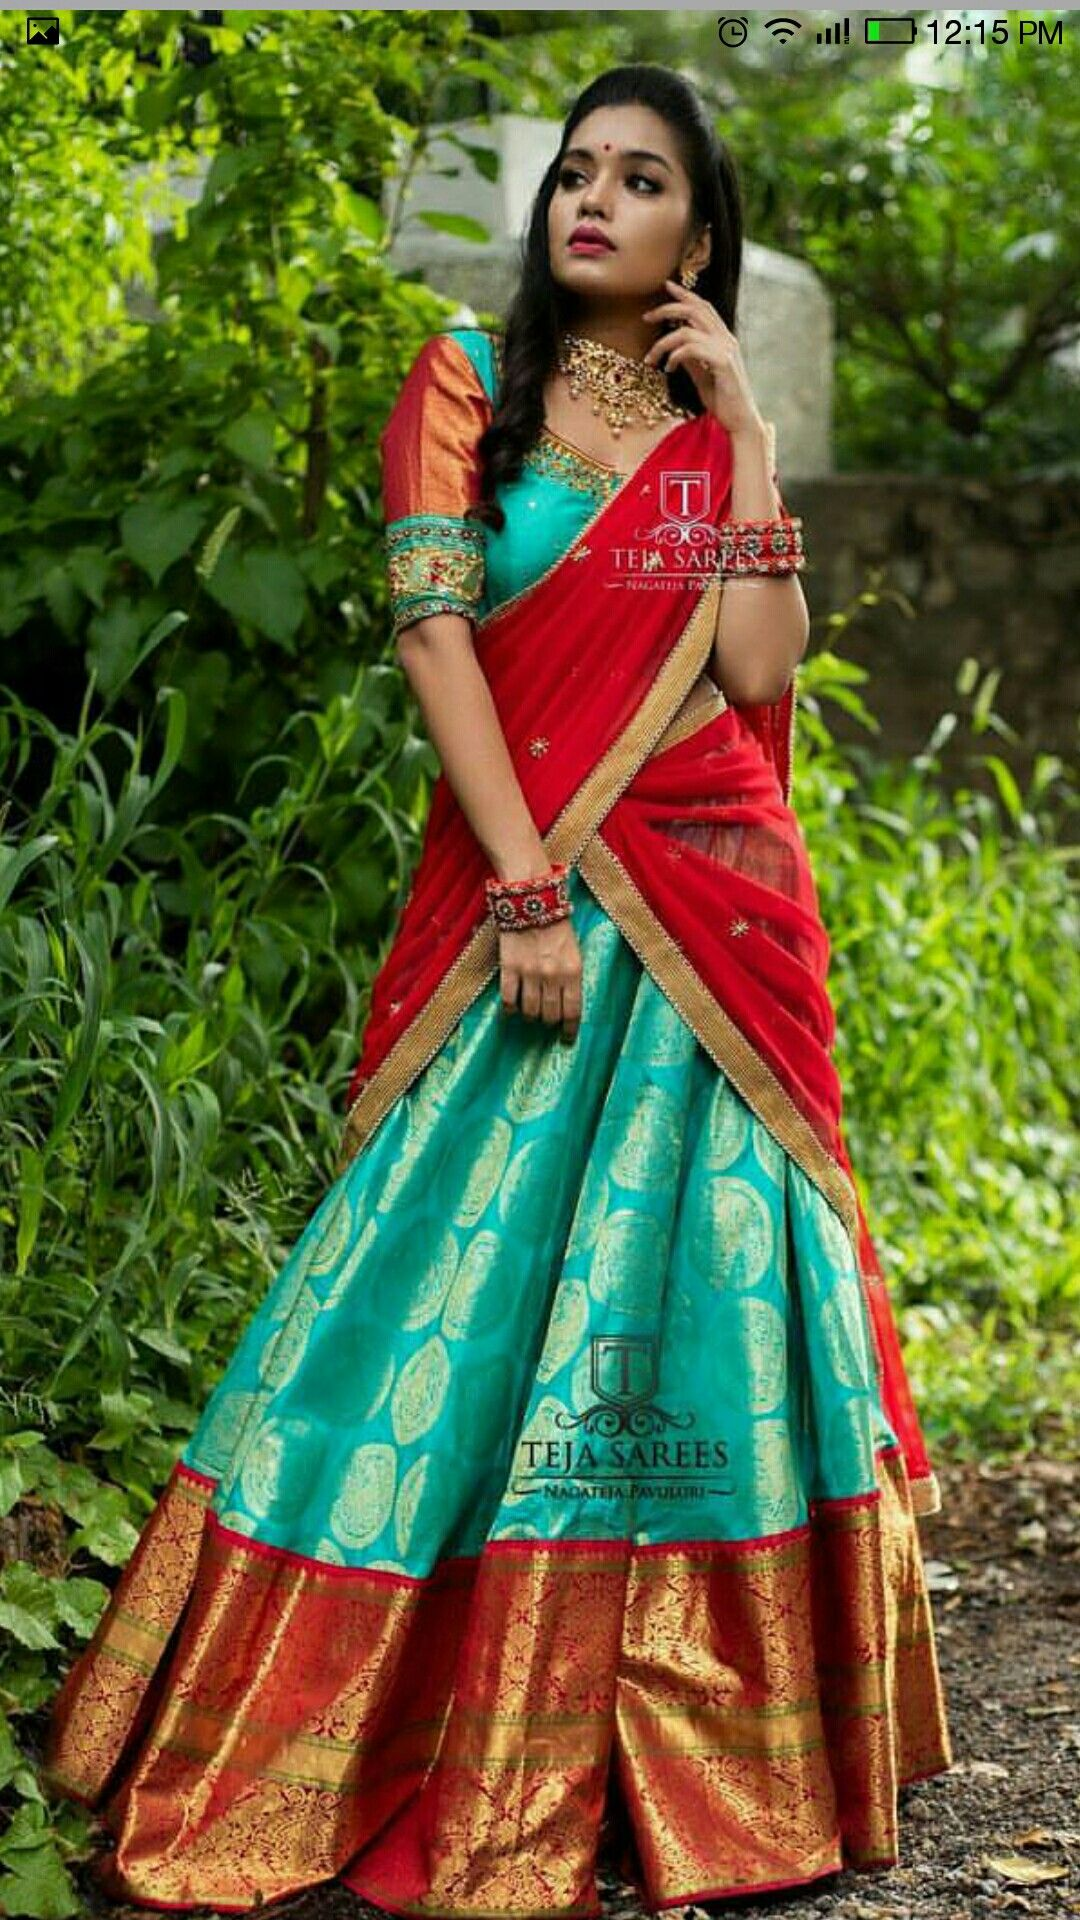 Pin By Swa Roopa On Pattu Half Sarees Half Saree Designs Half Saree Lehenga Bridal Lehenga Choli